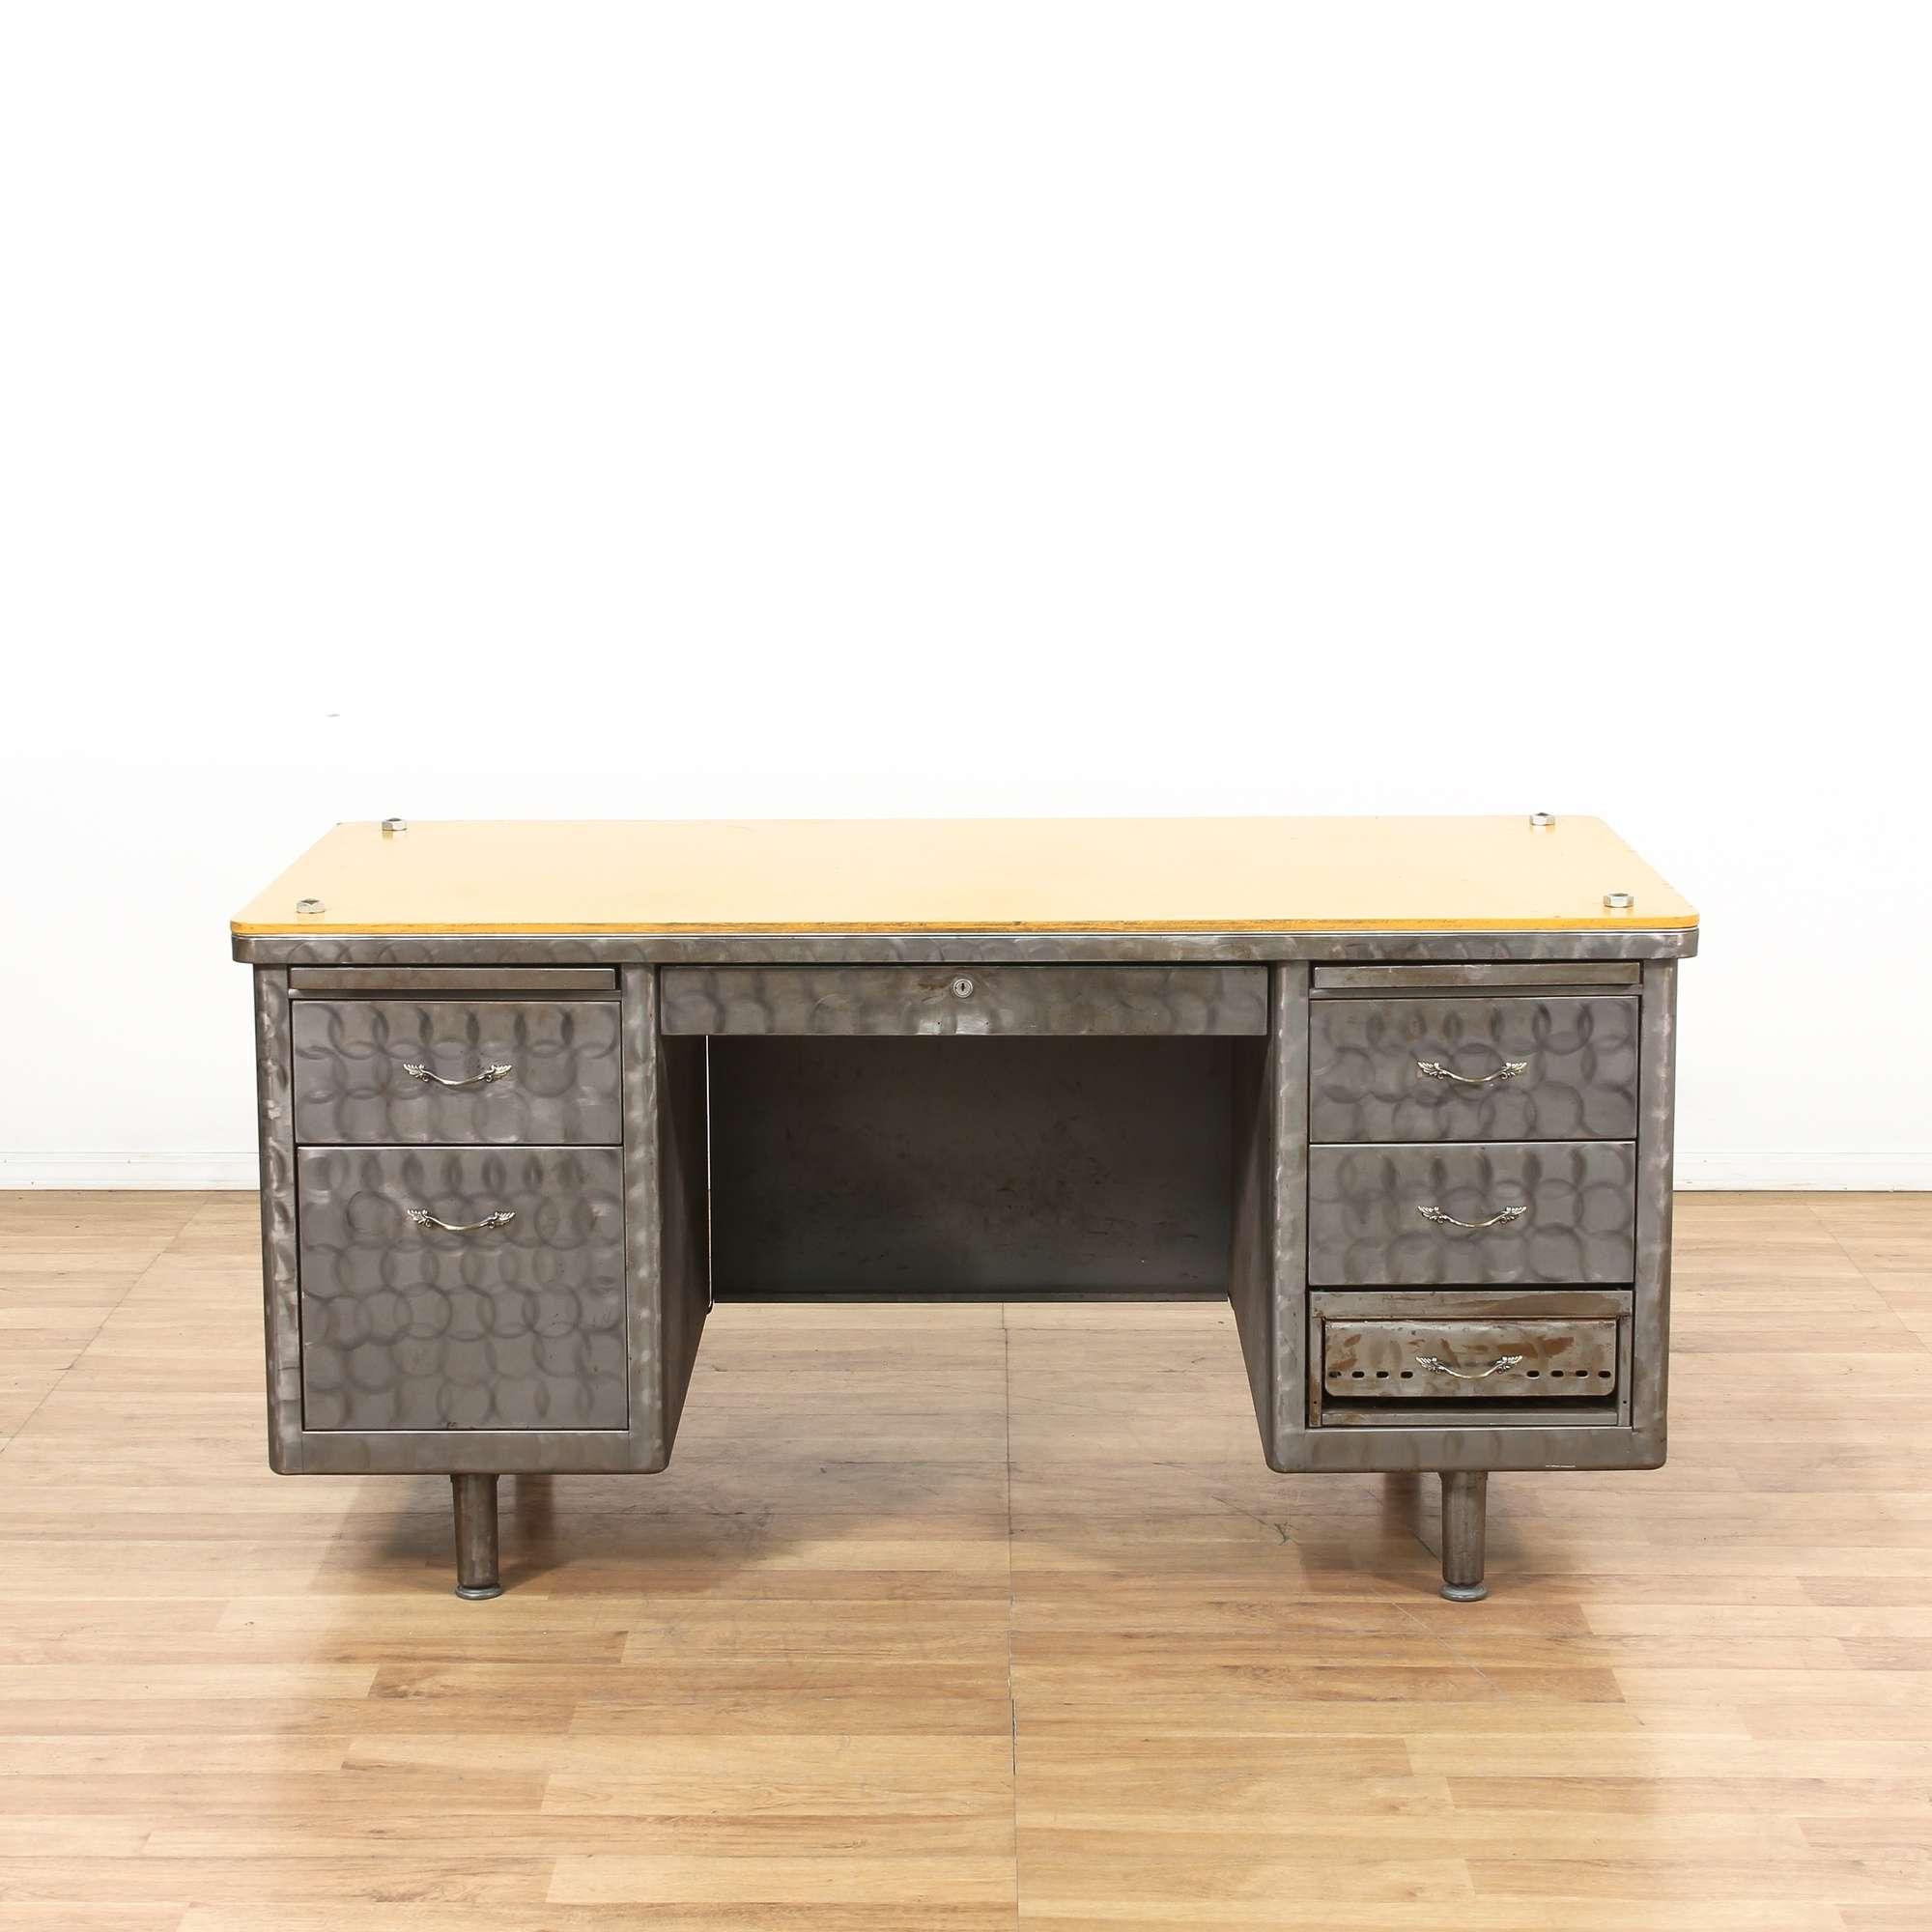 Steelcase Brushed Metal Tanker Desk 5 Loveseat Vintage Furniture Los Angeles